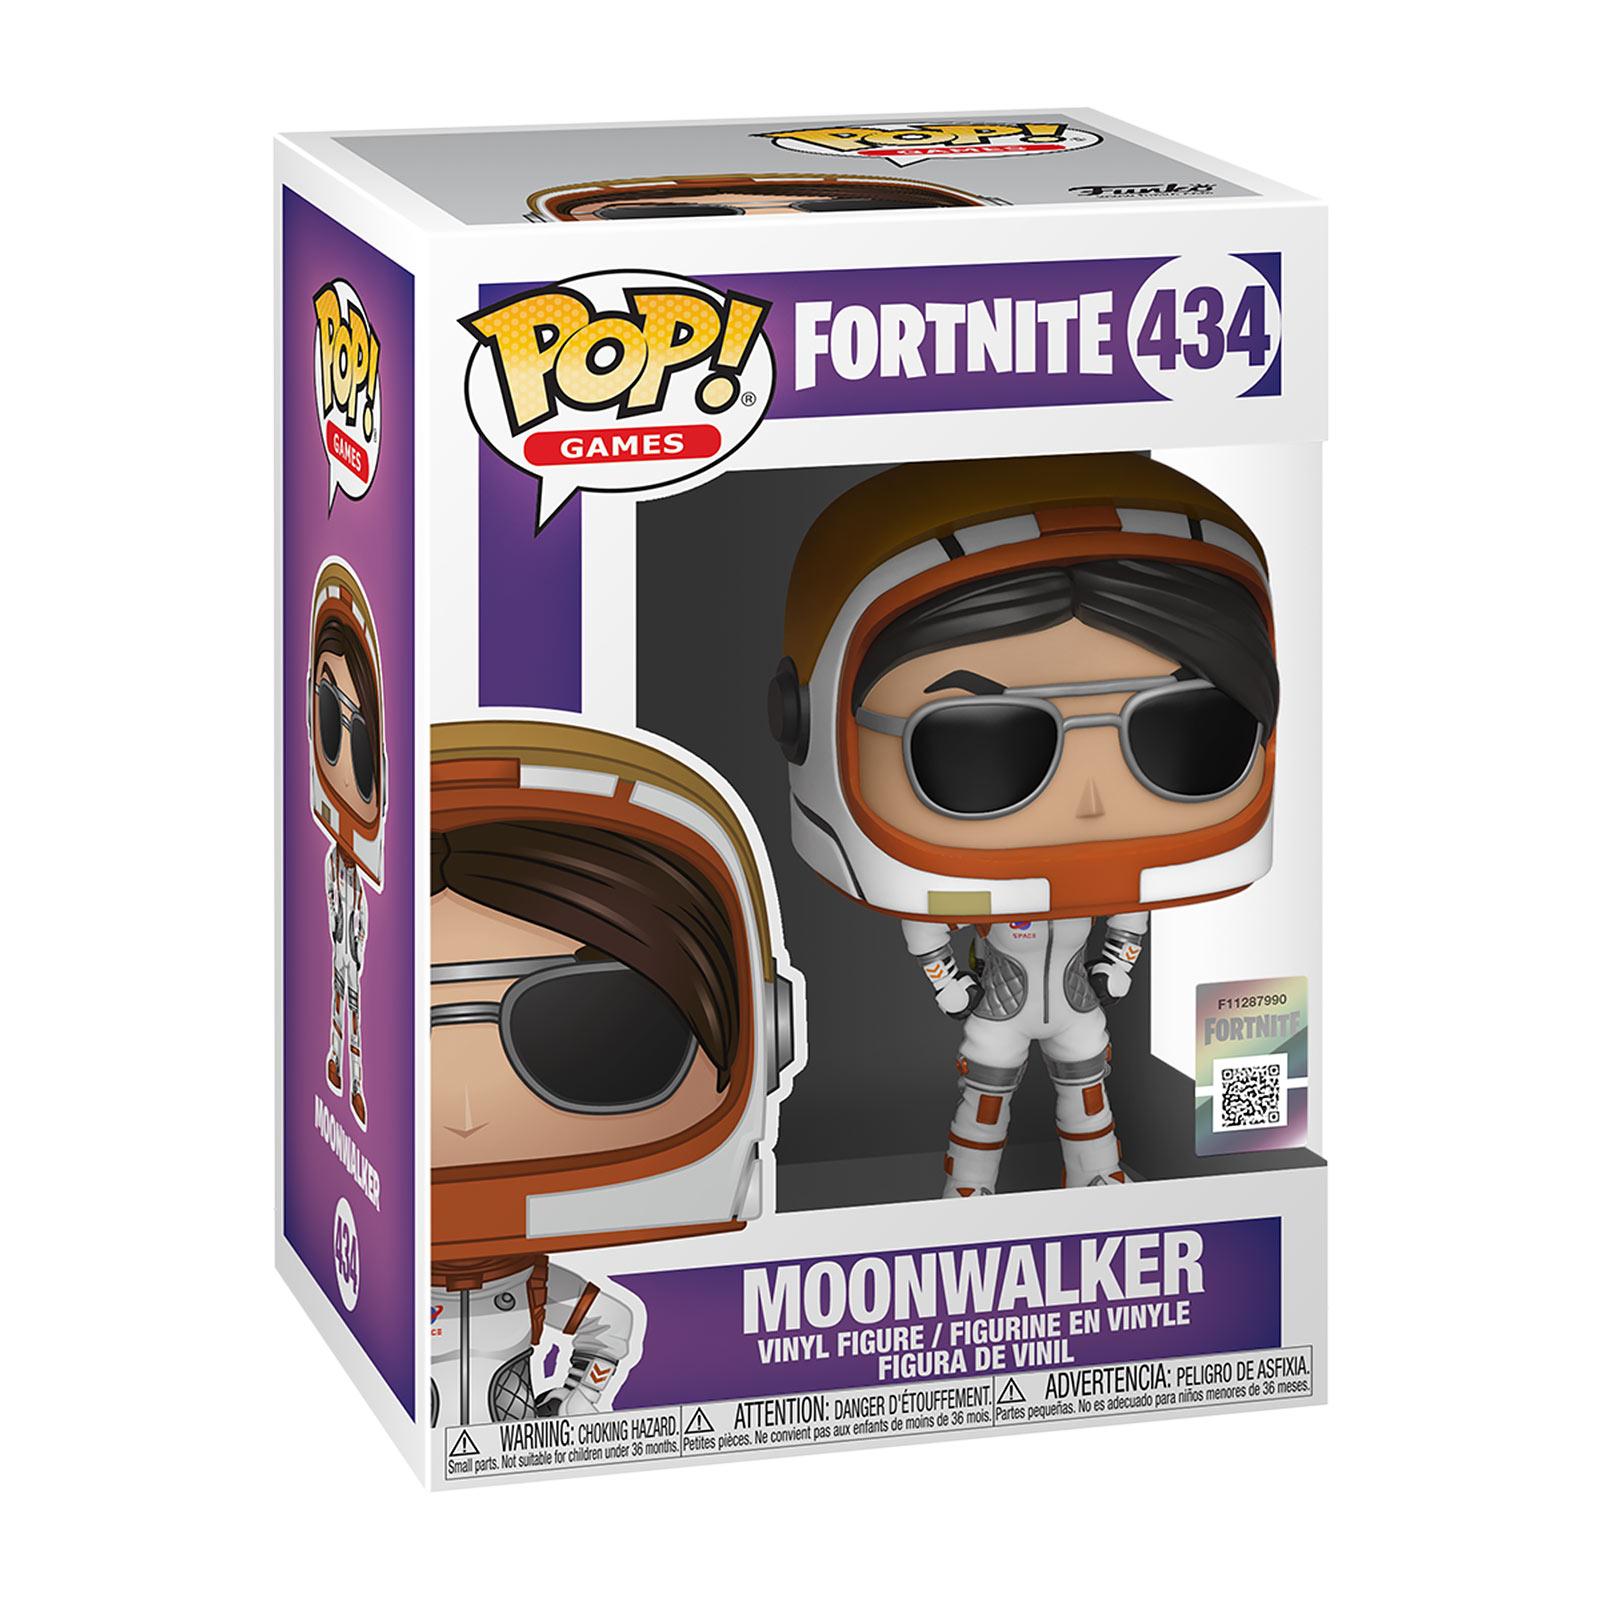 Fortnite - Moonwalker Funko Pop Figur